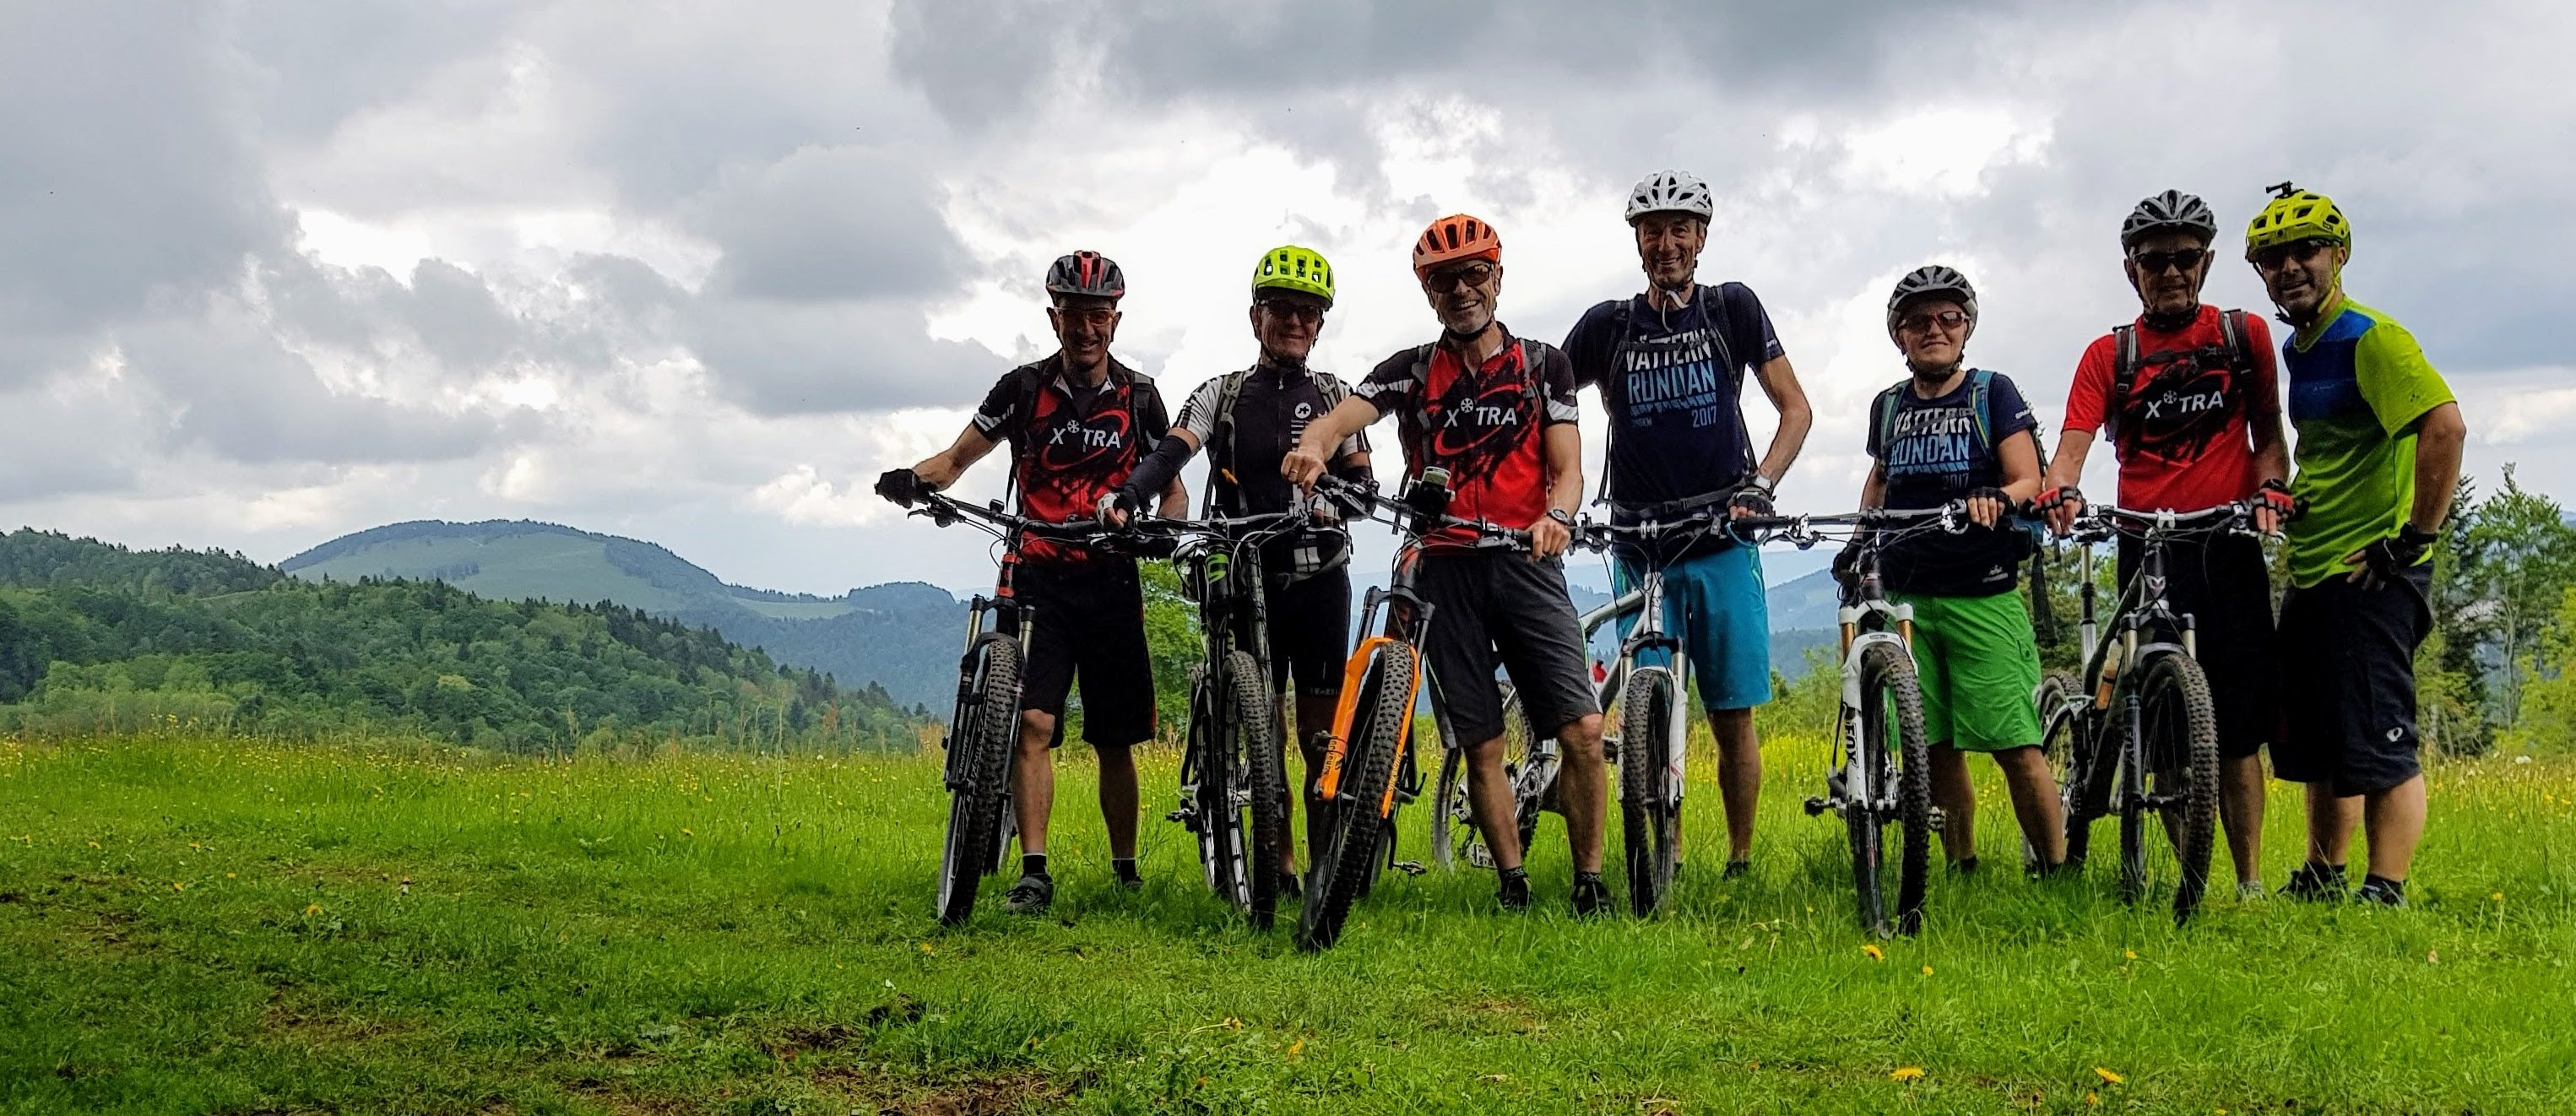 Erste Werktags-Biketour im Naturpark Balsthal